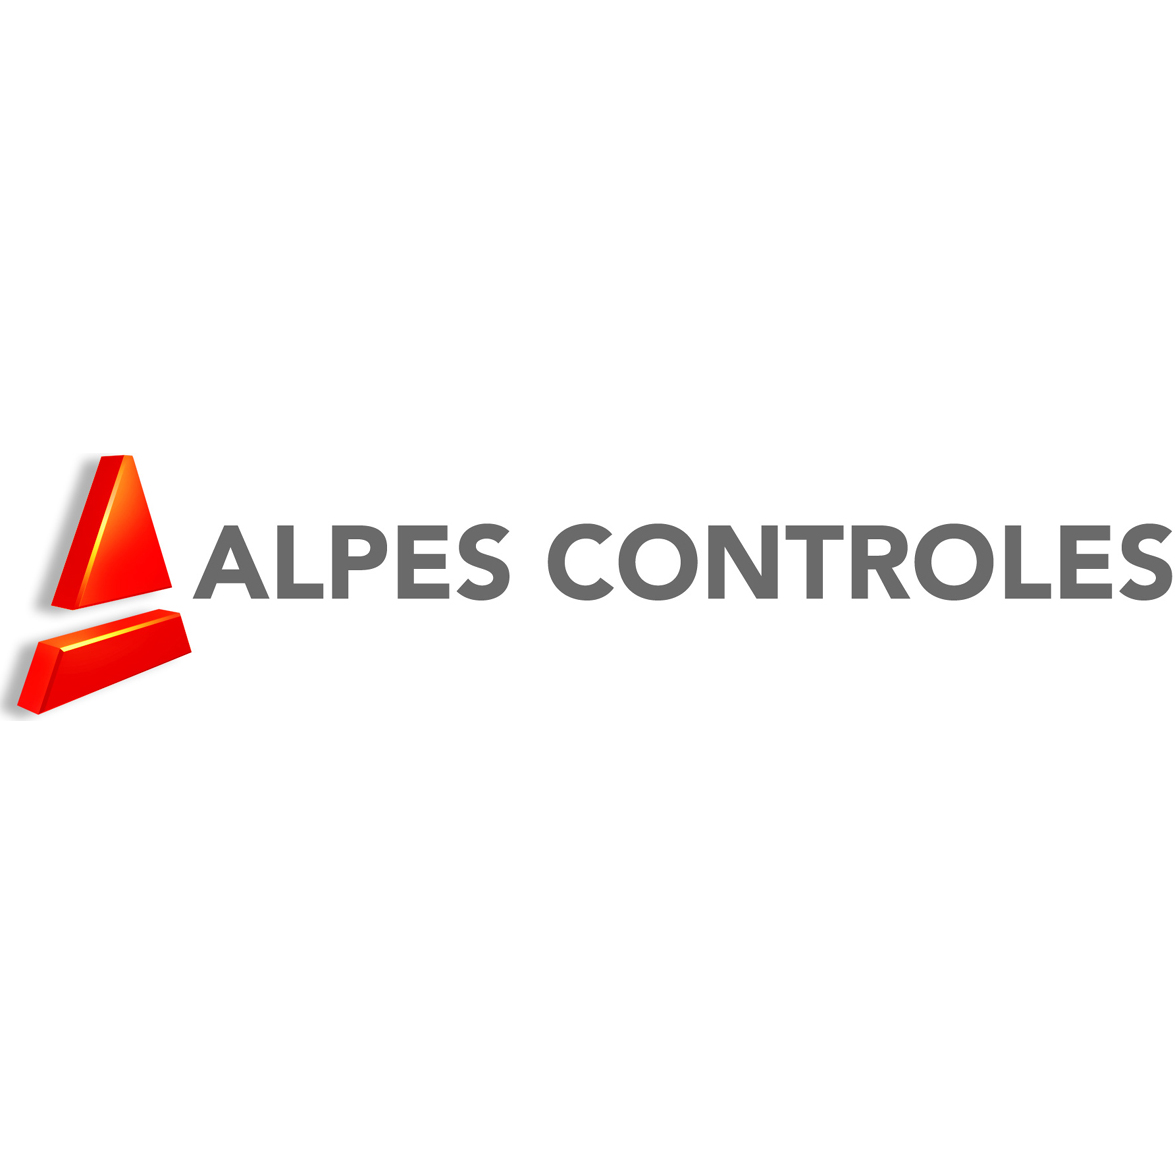 logo Alpes controles